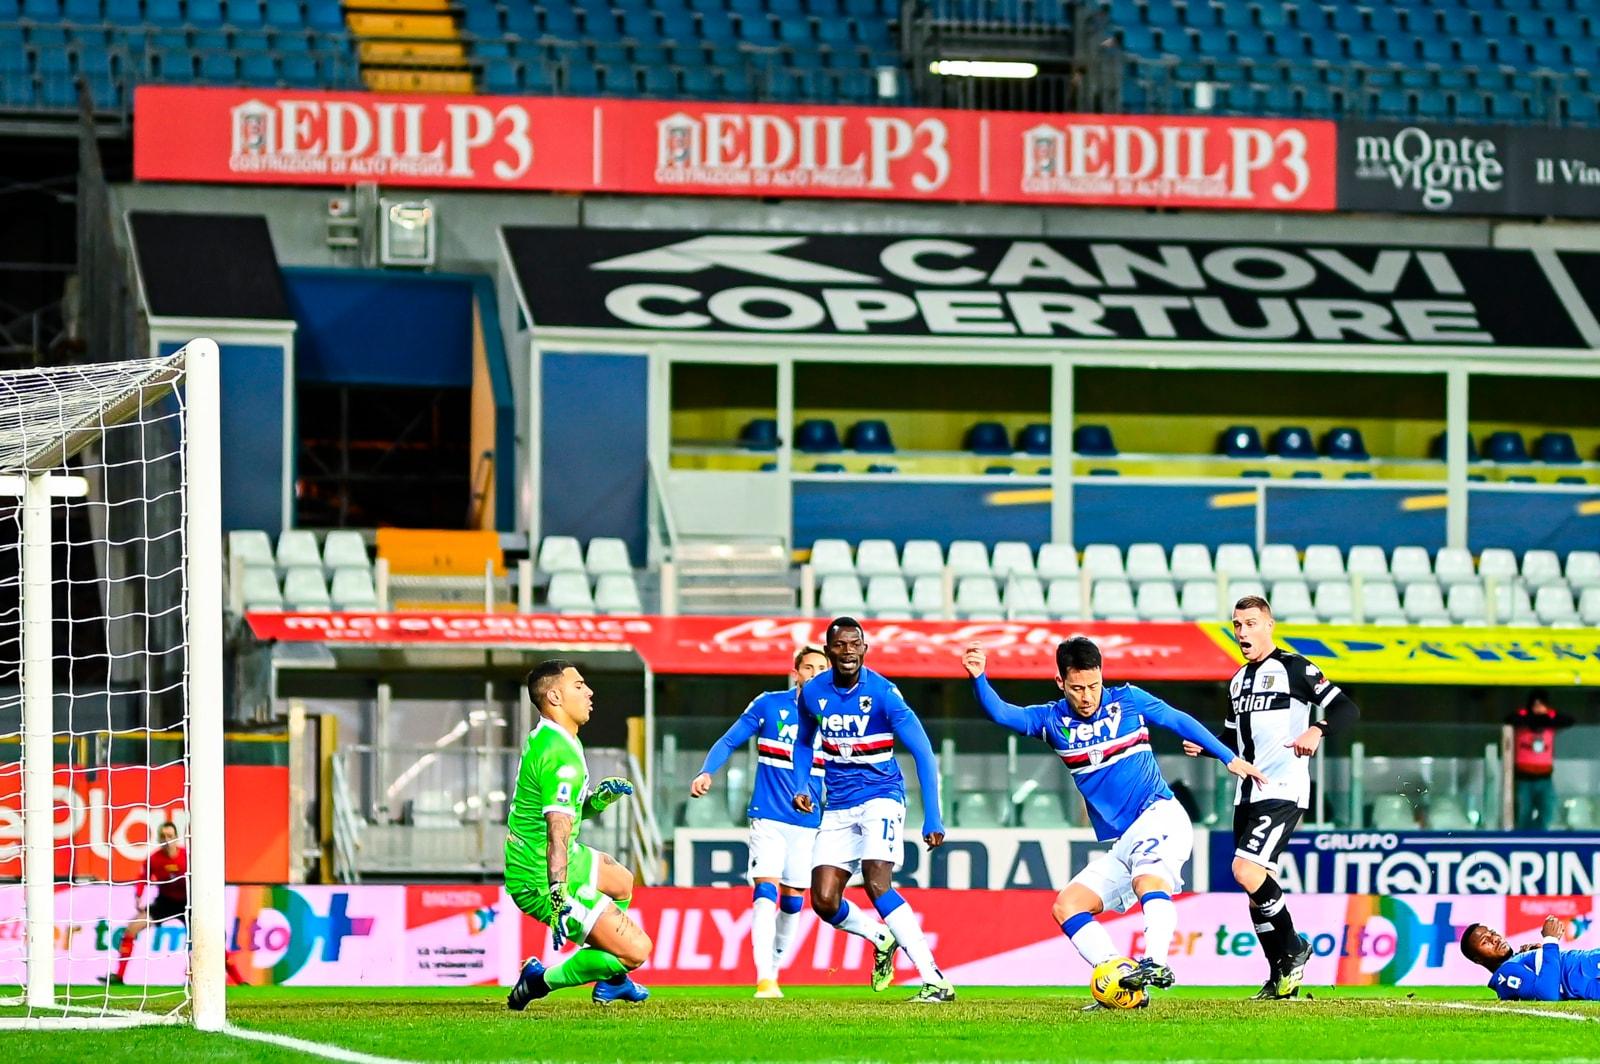 Parma, sfortuna ed errori: Yoshida e Keita fanno sorridere la Sampdoria